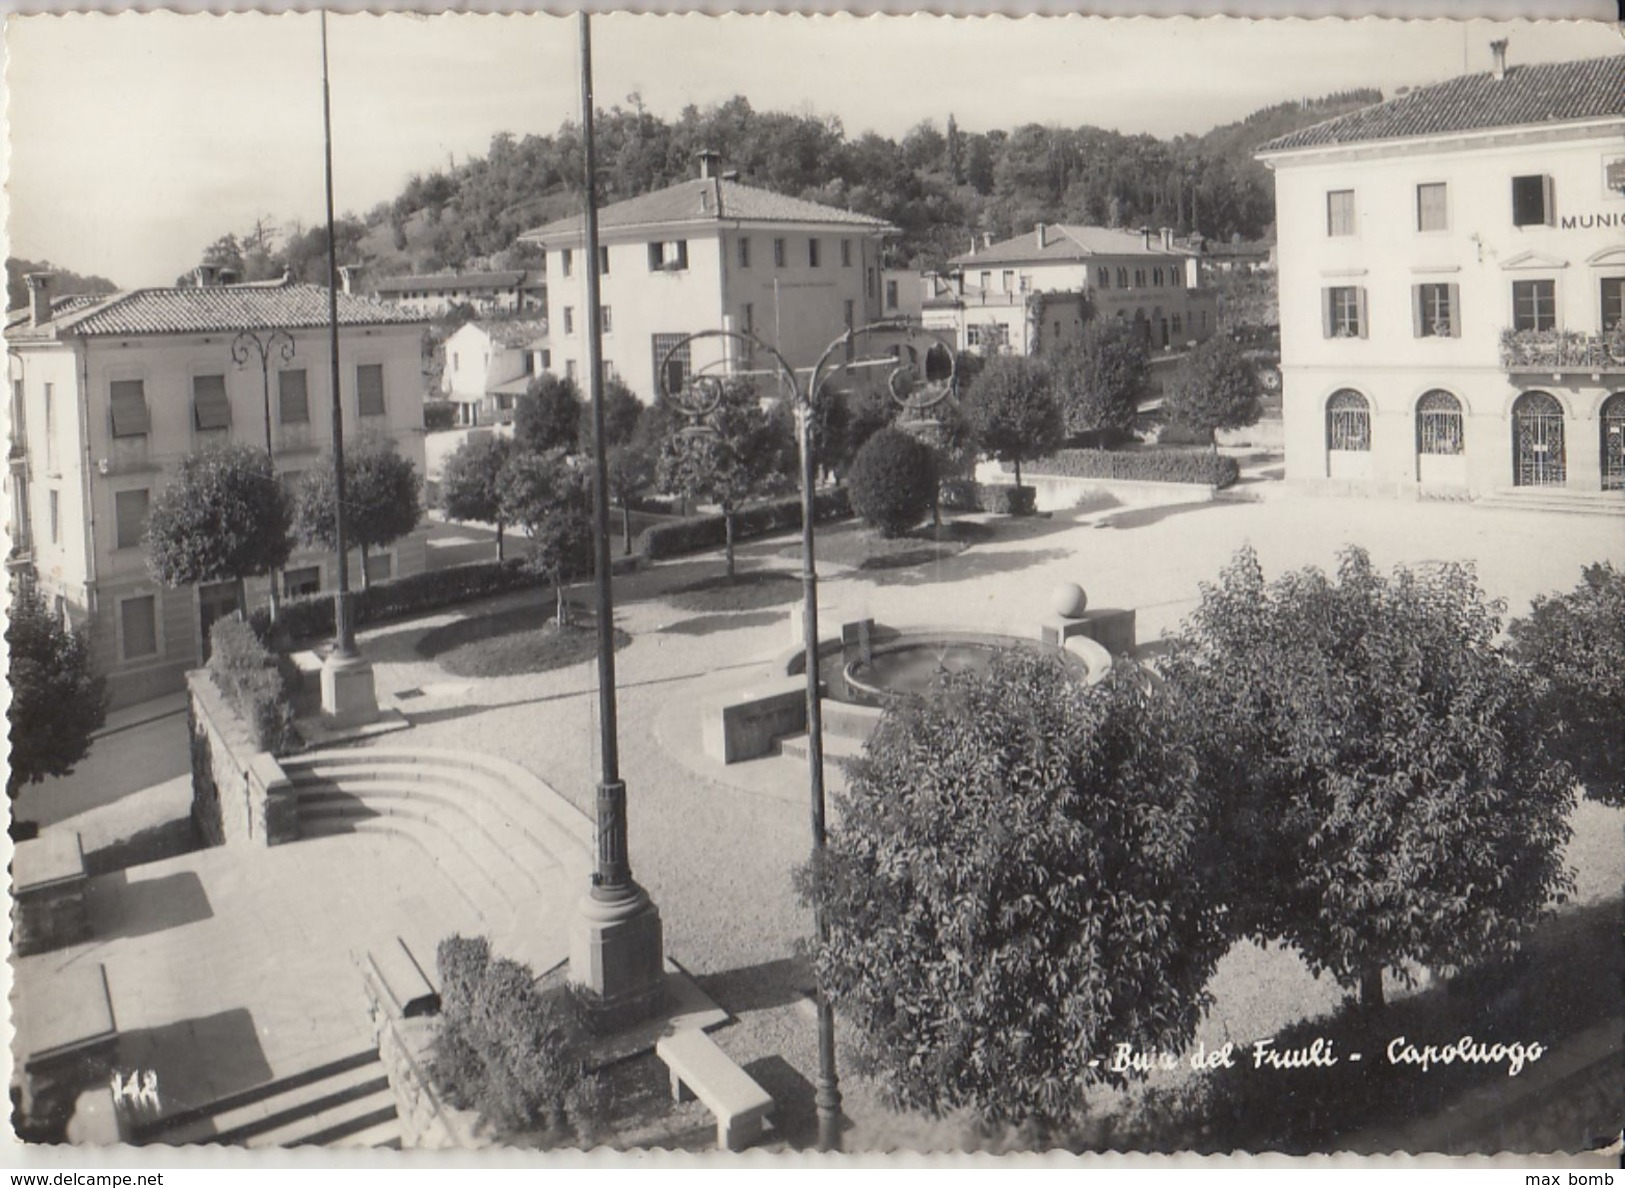 1958 BUIA DEL FRIULI (UDINE)  --- Q1101 - Udine